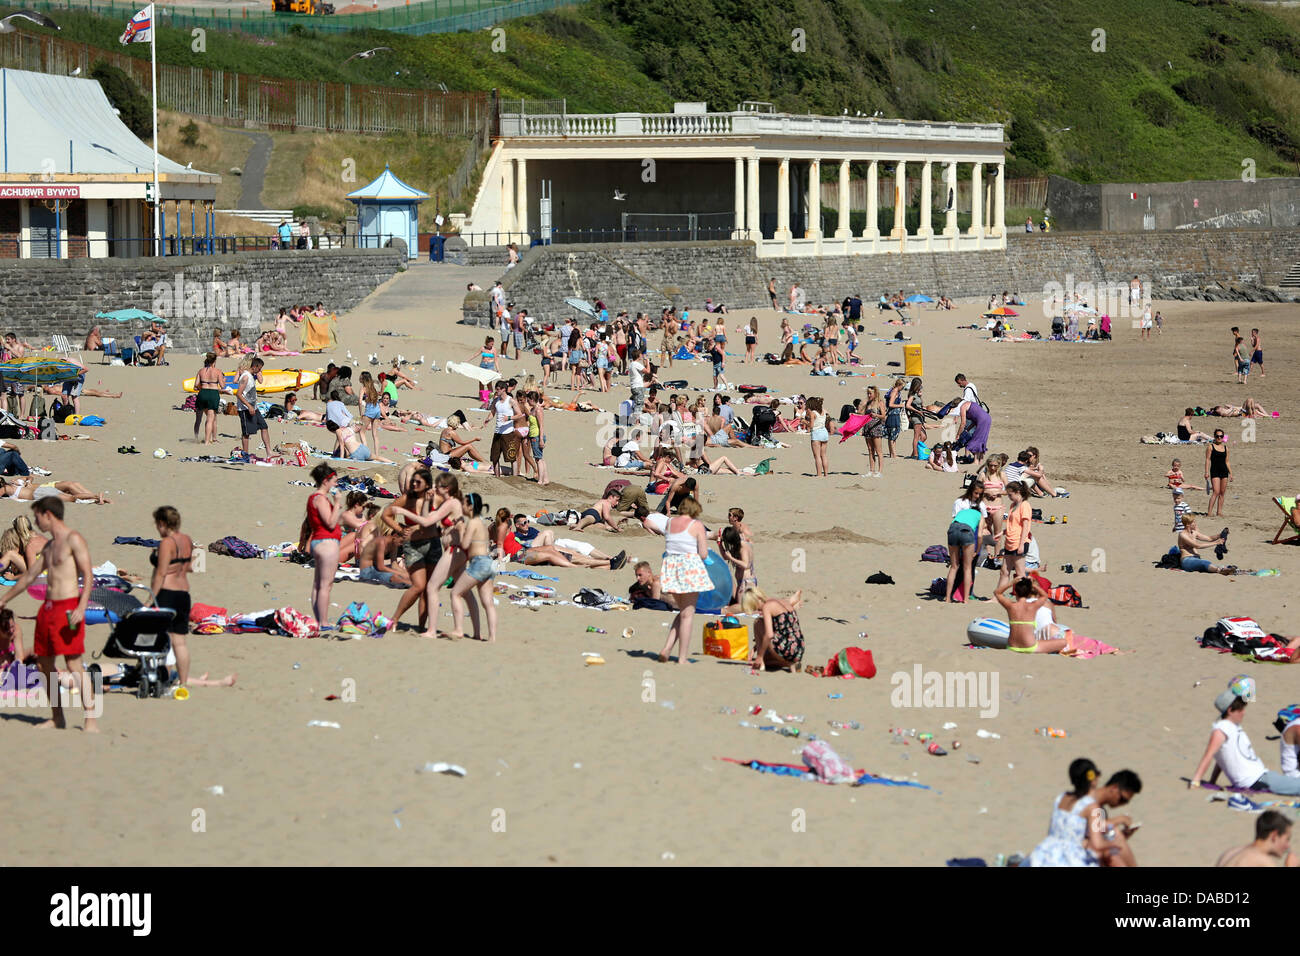 Barry Island, south Wales, UK, Tuesday 09 July 2013  Pictured: Whitmore Bay beach in Barry Island, south Wales. Stock Photo